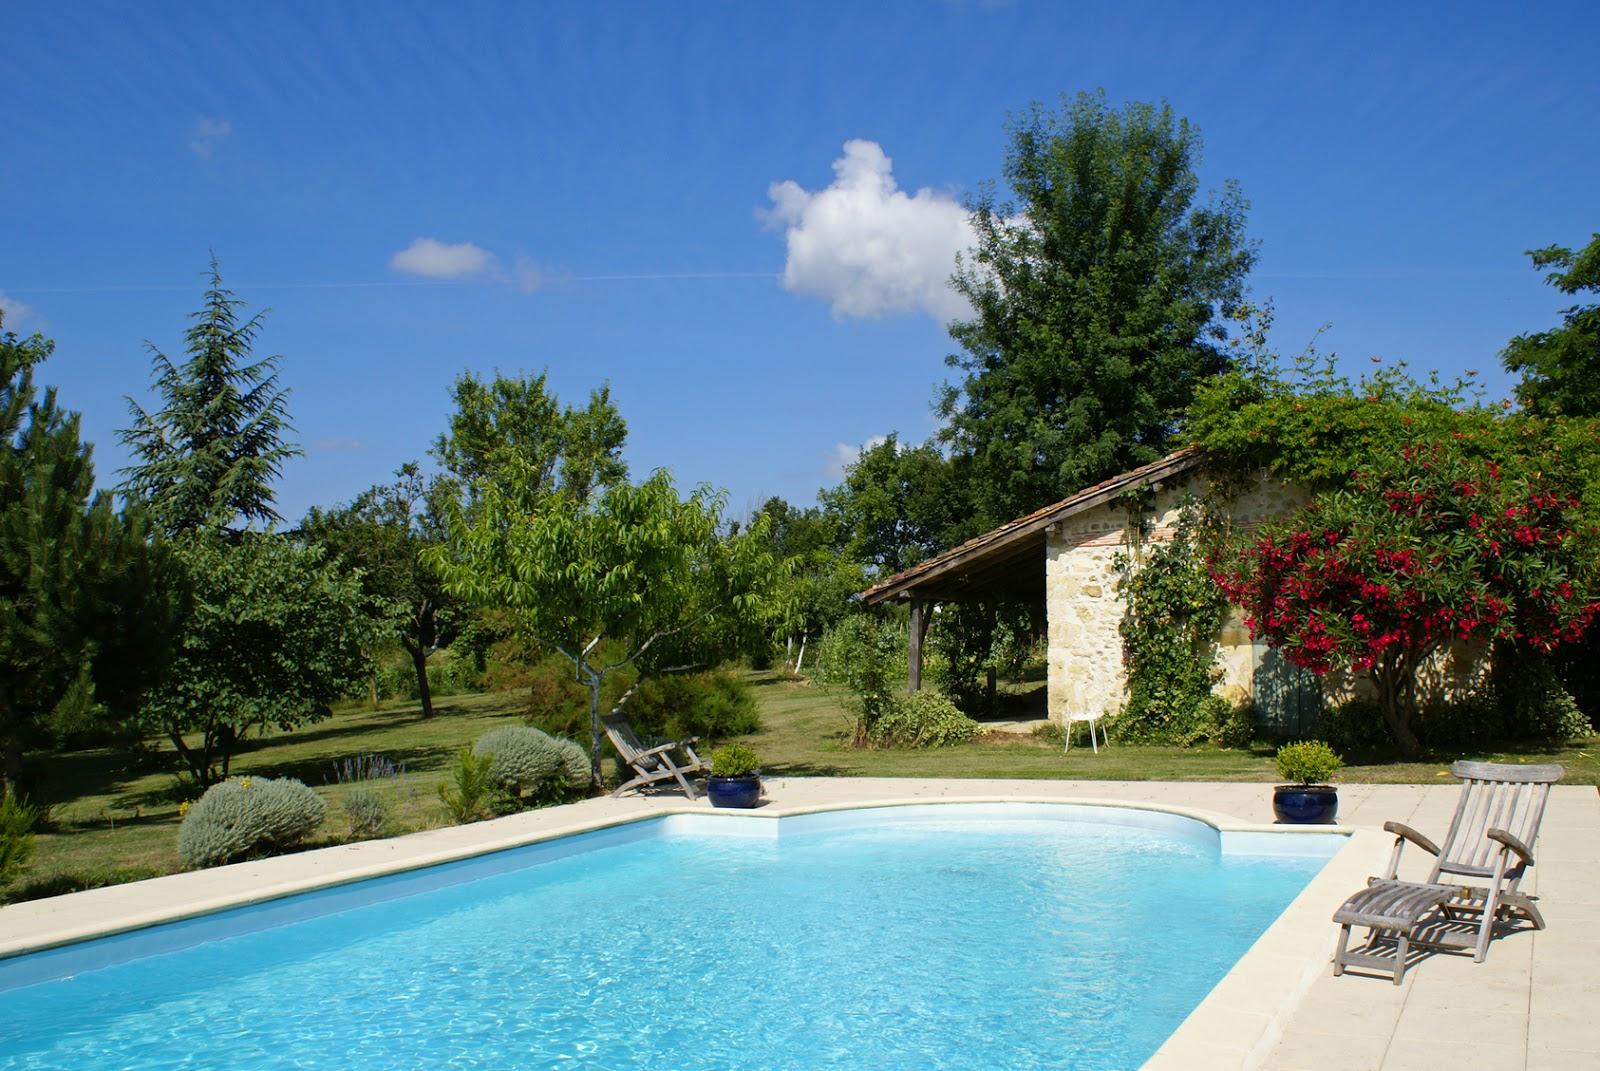 astuces entretenir sa piscine pendant l 39 t conso collab. Black Bedroom Furniture Sets. Home Design Ideas